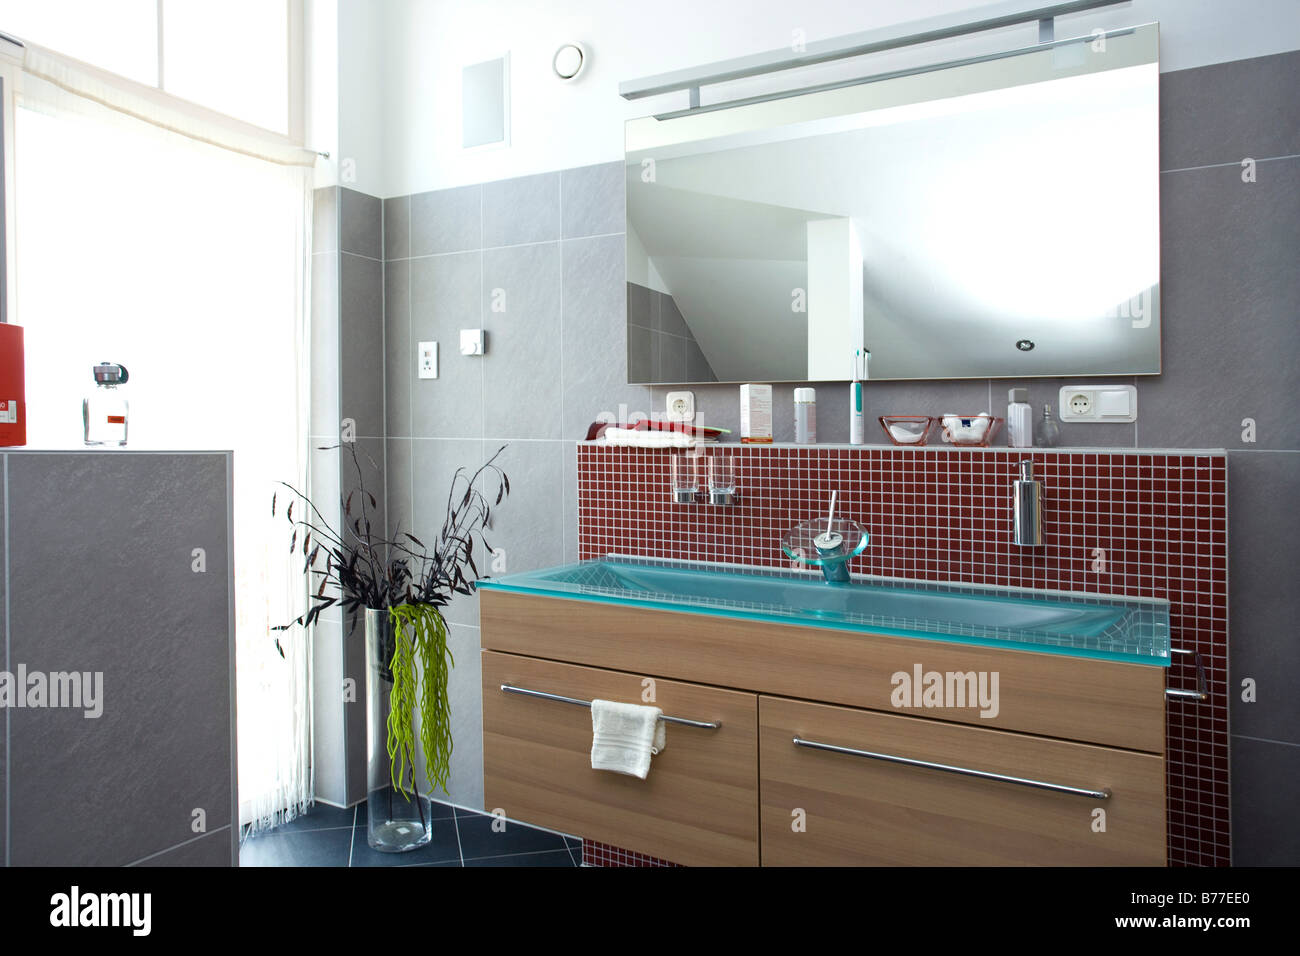 Modernes Badezimmer, Modern Bath Room